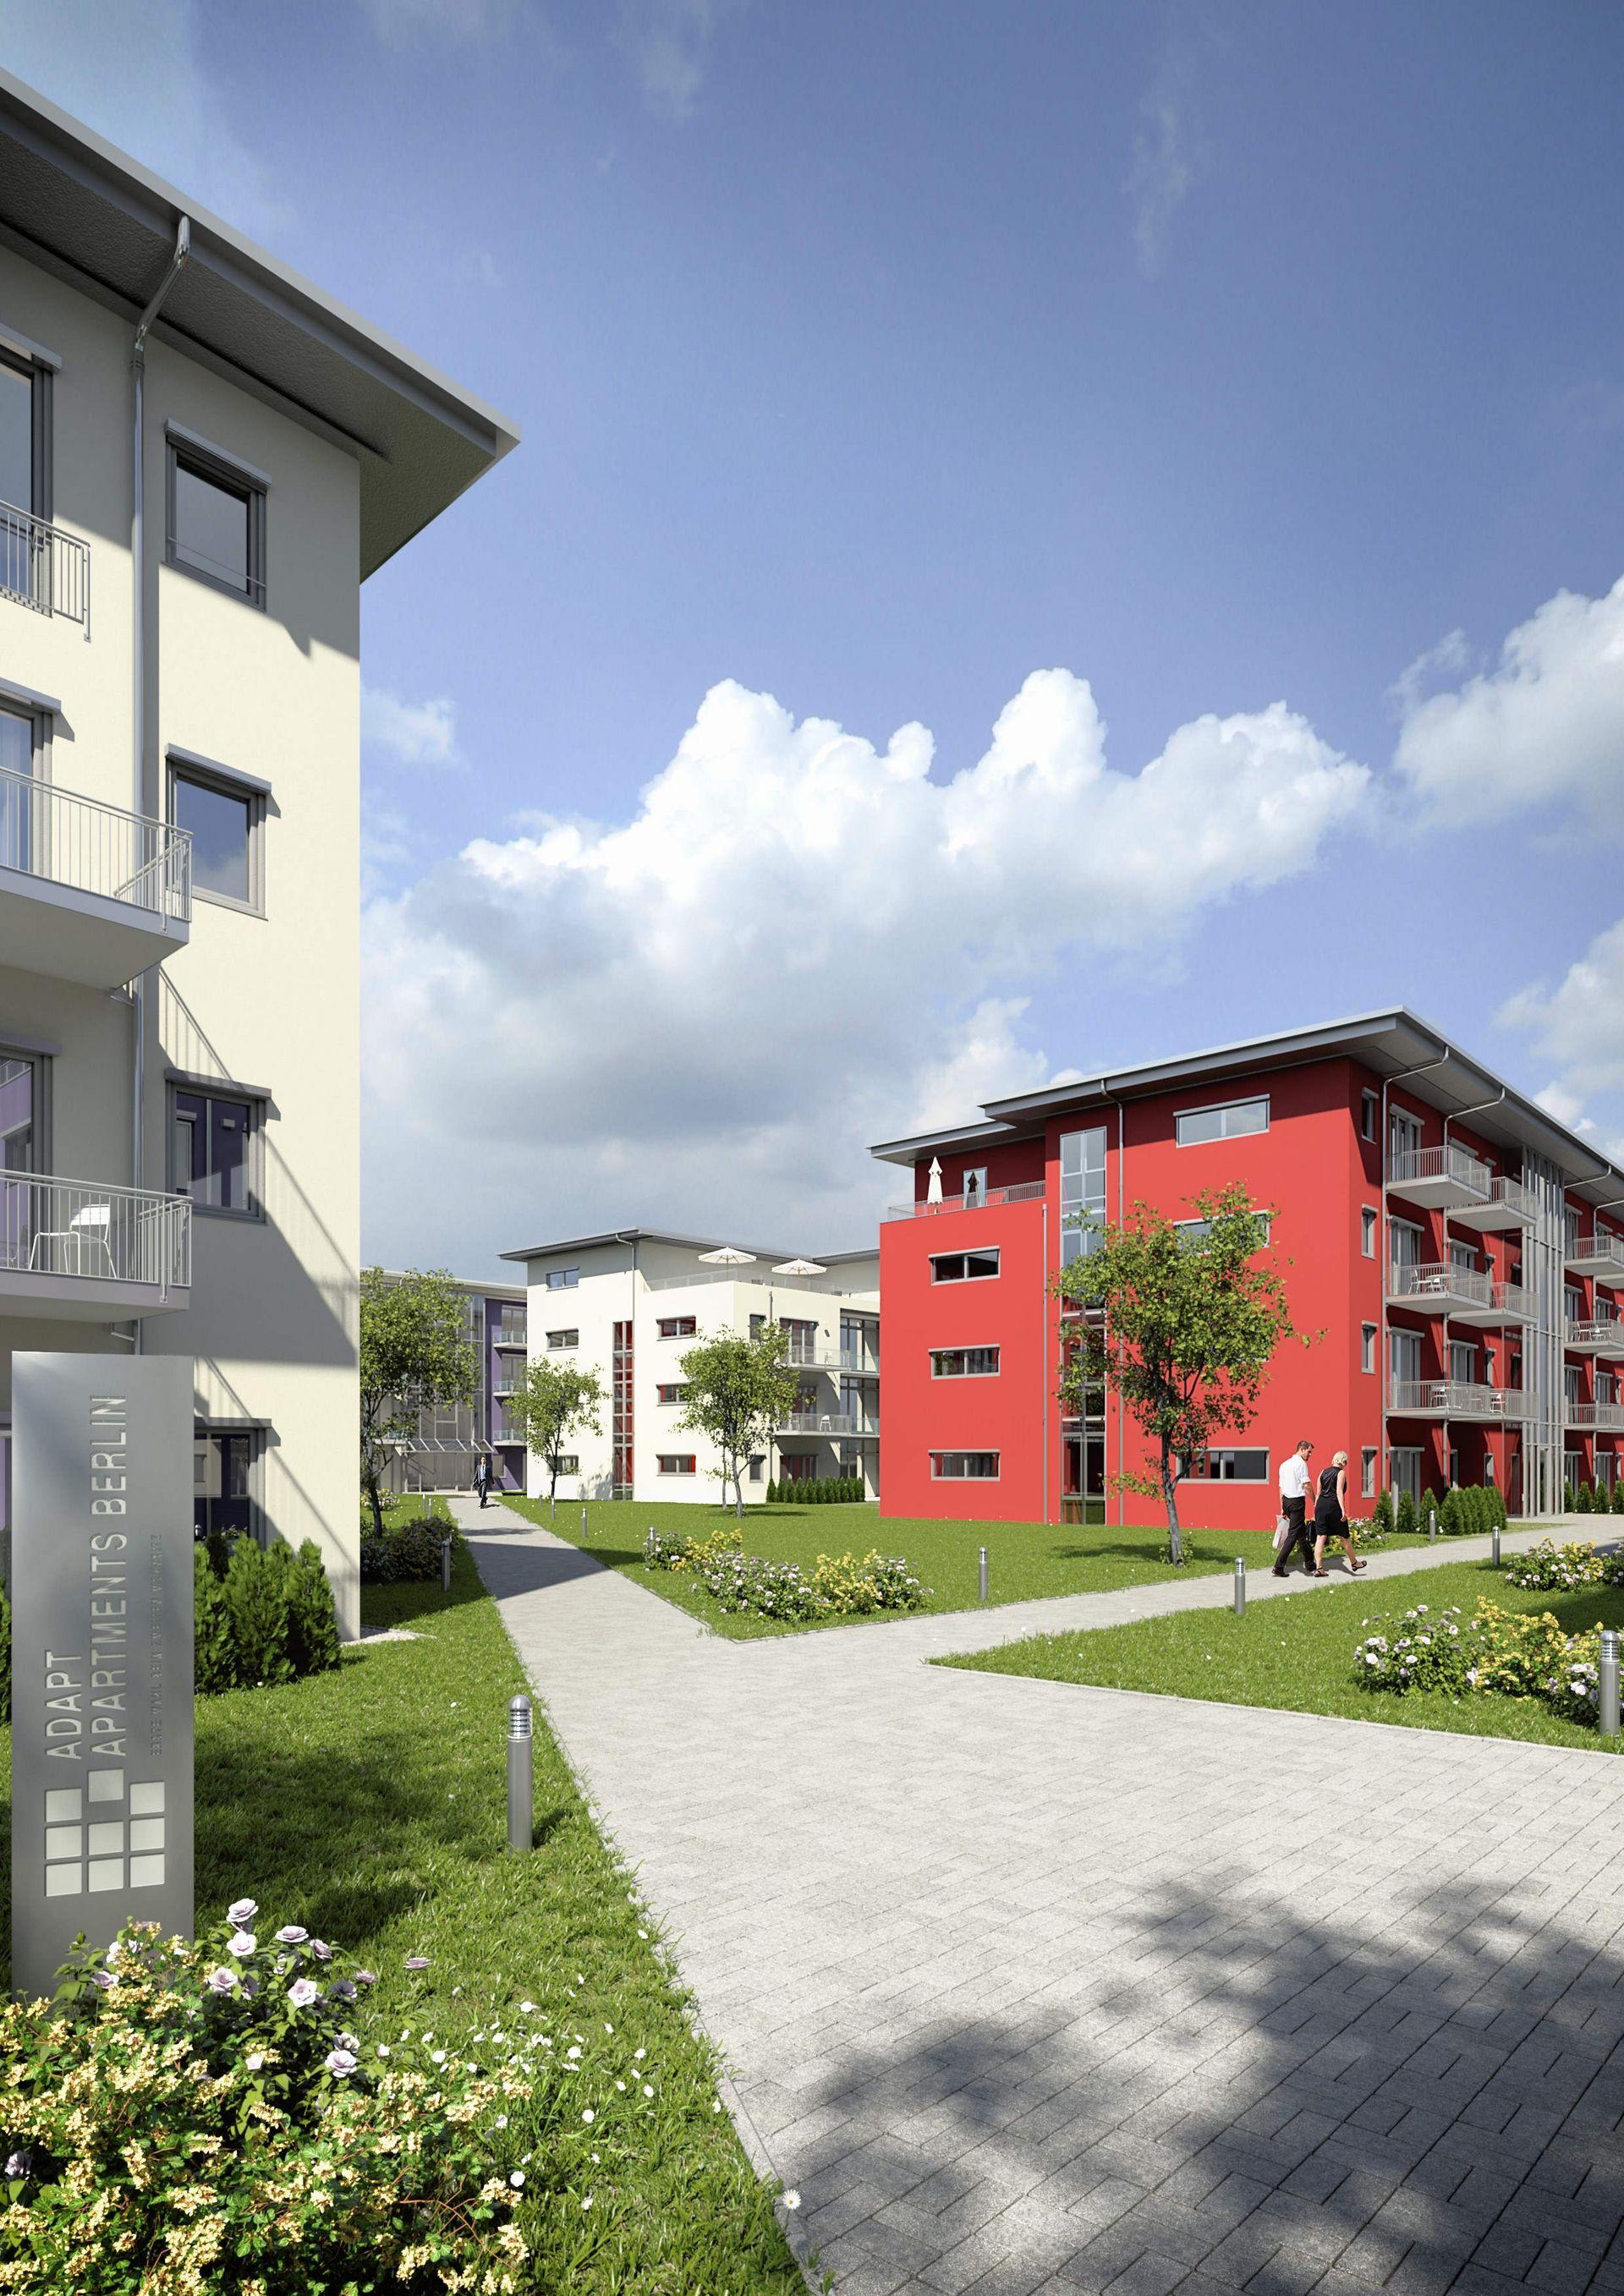 Architekturvisualisierung Berlin 3d visualisation of architecture projects gmsvision